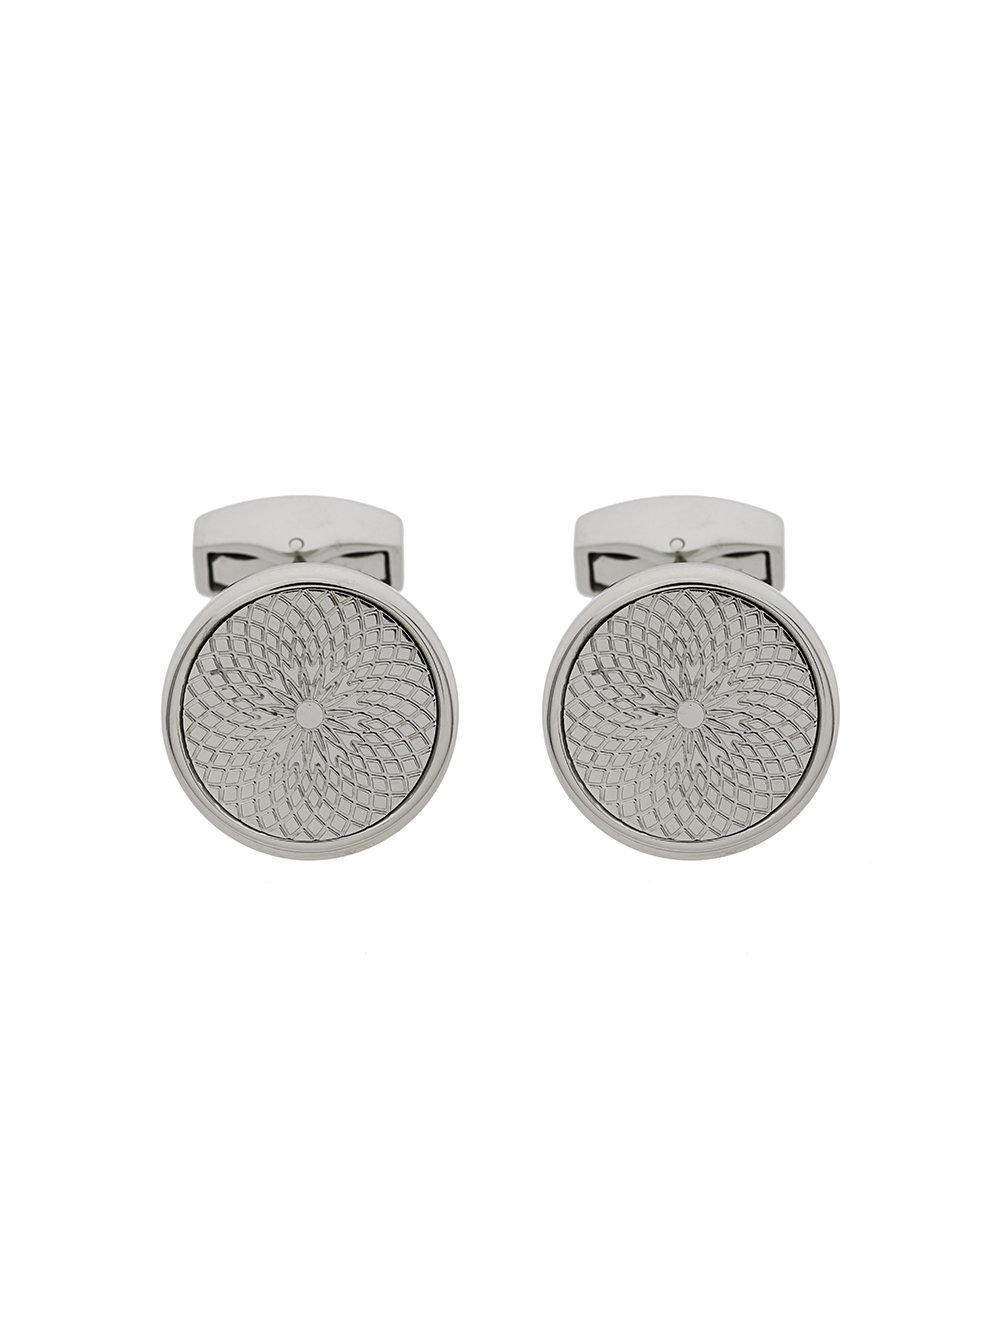 Tateossian Engraved Circular Cufflinks